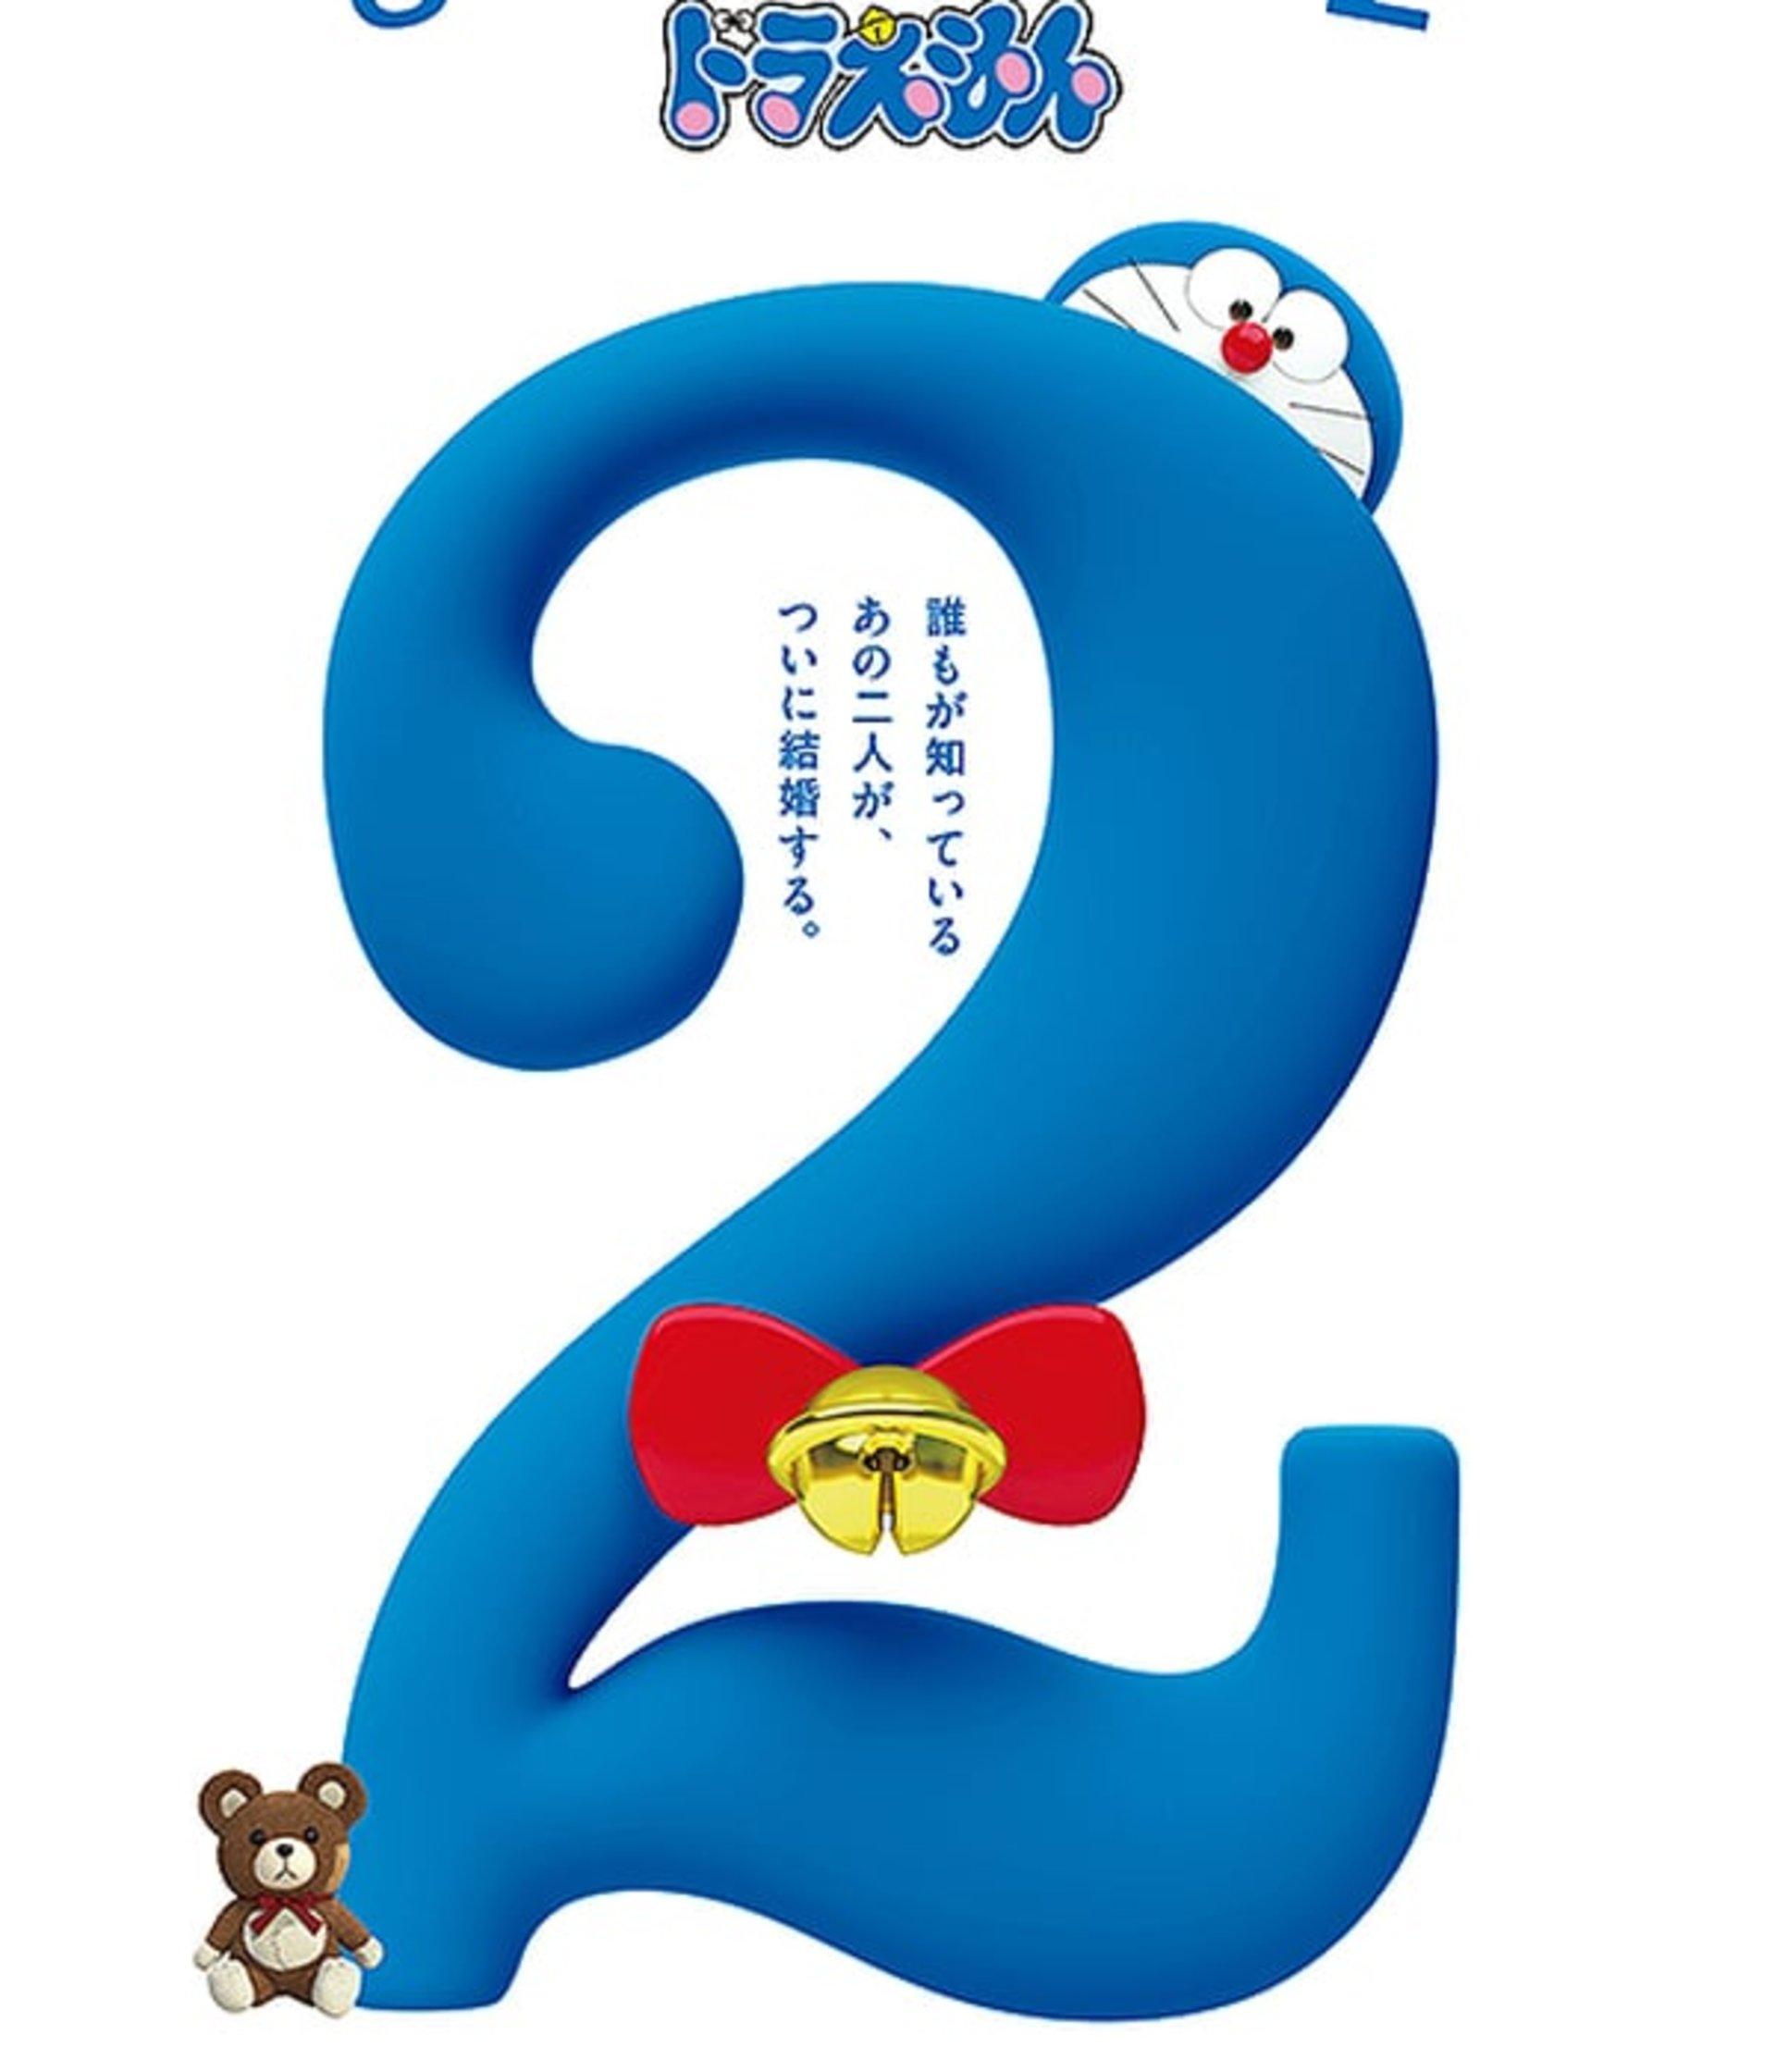 Film Stand By Me Doraemon 2 (2020) Quality Bluray Sub Indo ...